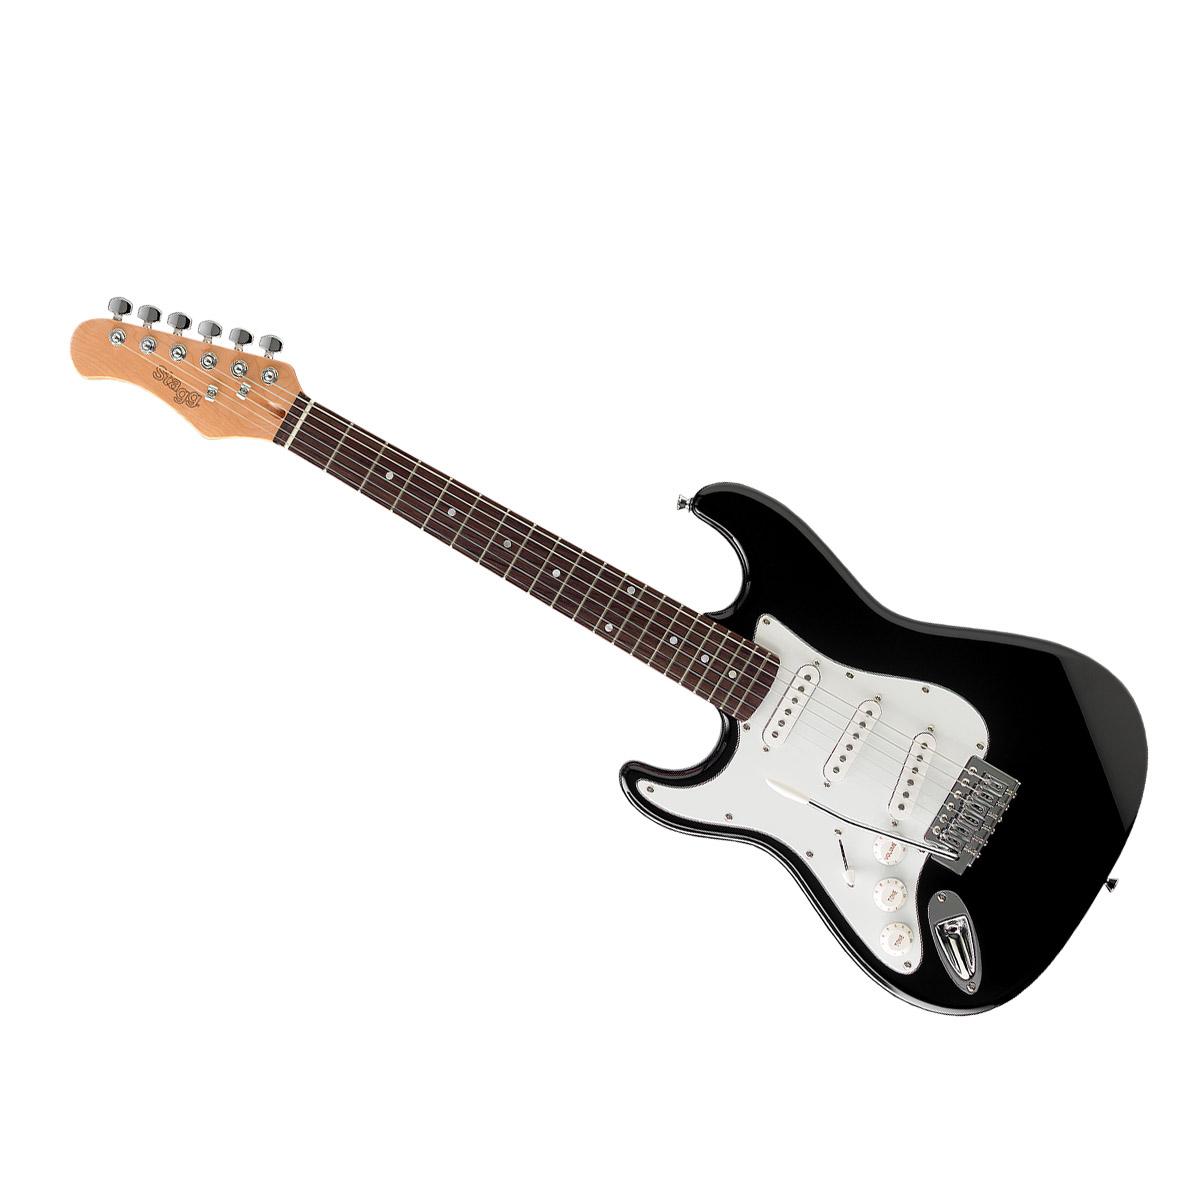 guitare electrique hagstrom